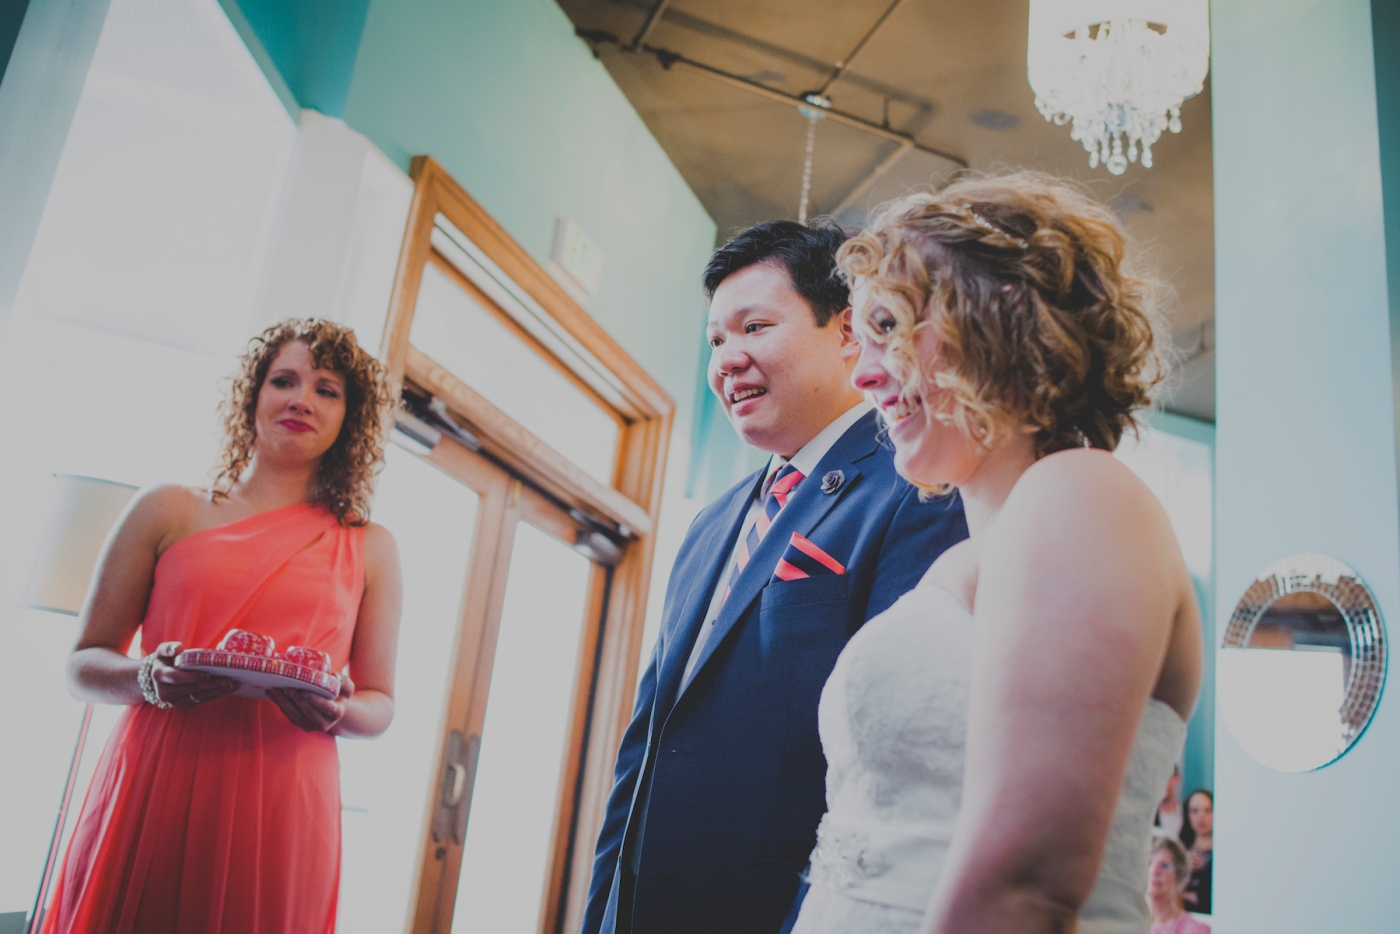 DSC_2999Everett_Wedding_Ballroom_Jane_Speleers_photography_Rachel_and_Edmund_teaceremony_2017